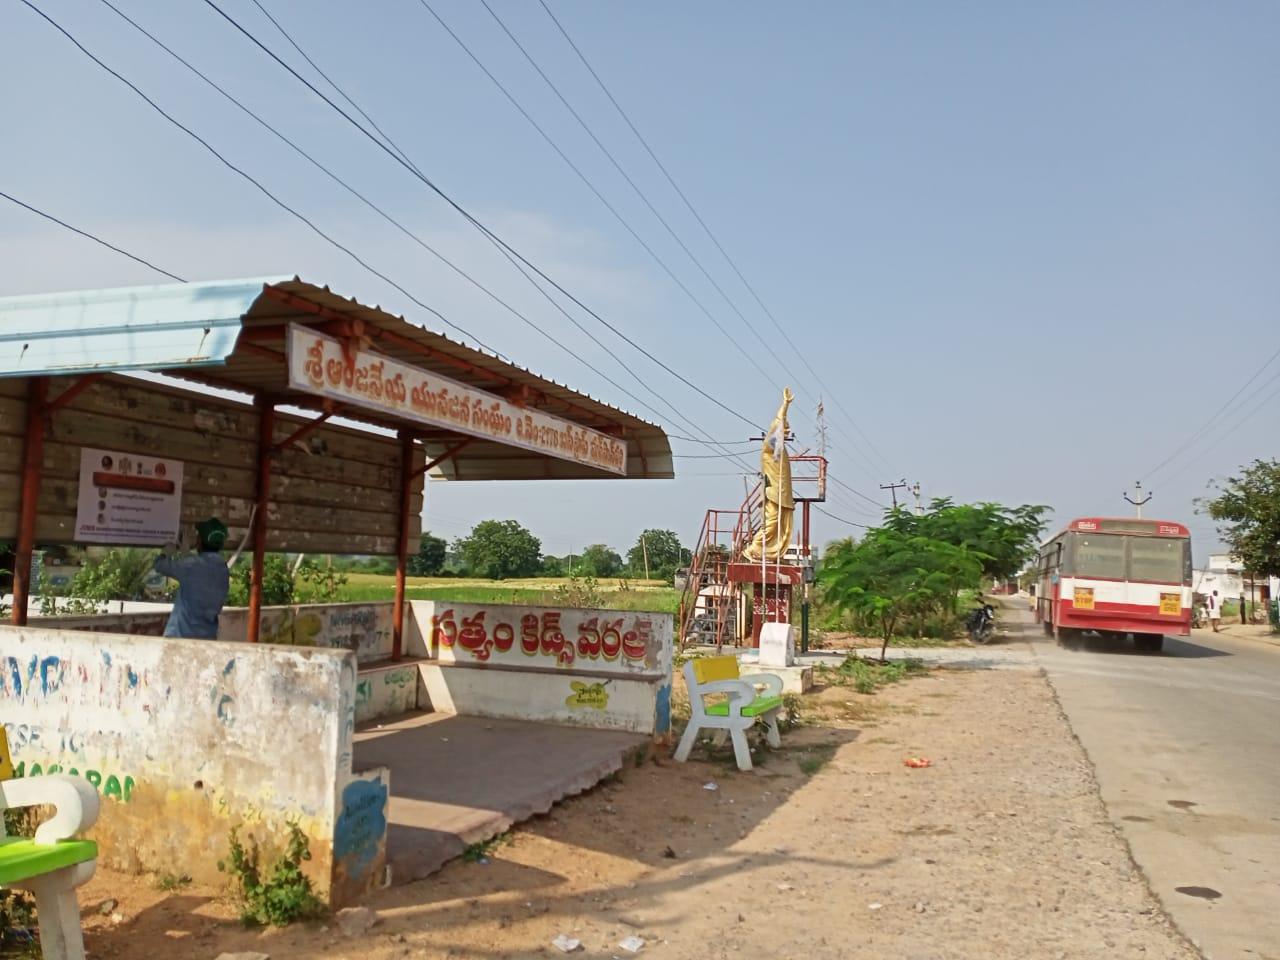 Janandolan campaign on COVID 19 -Manasapally Village